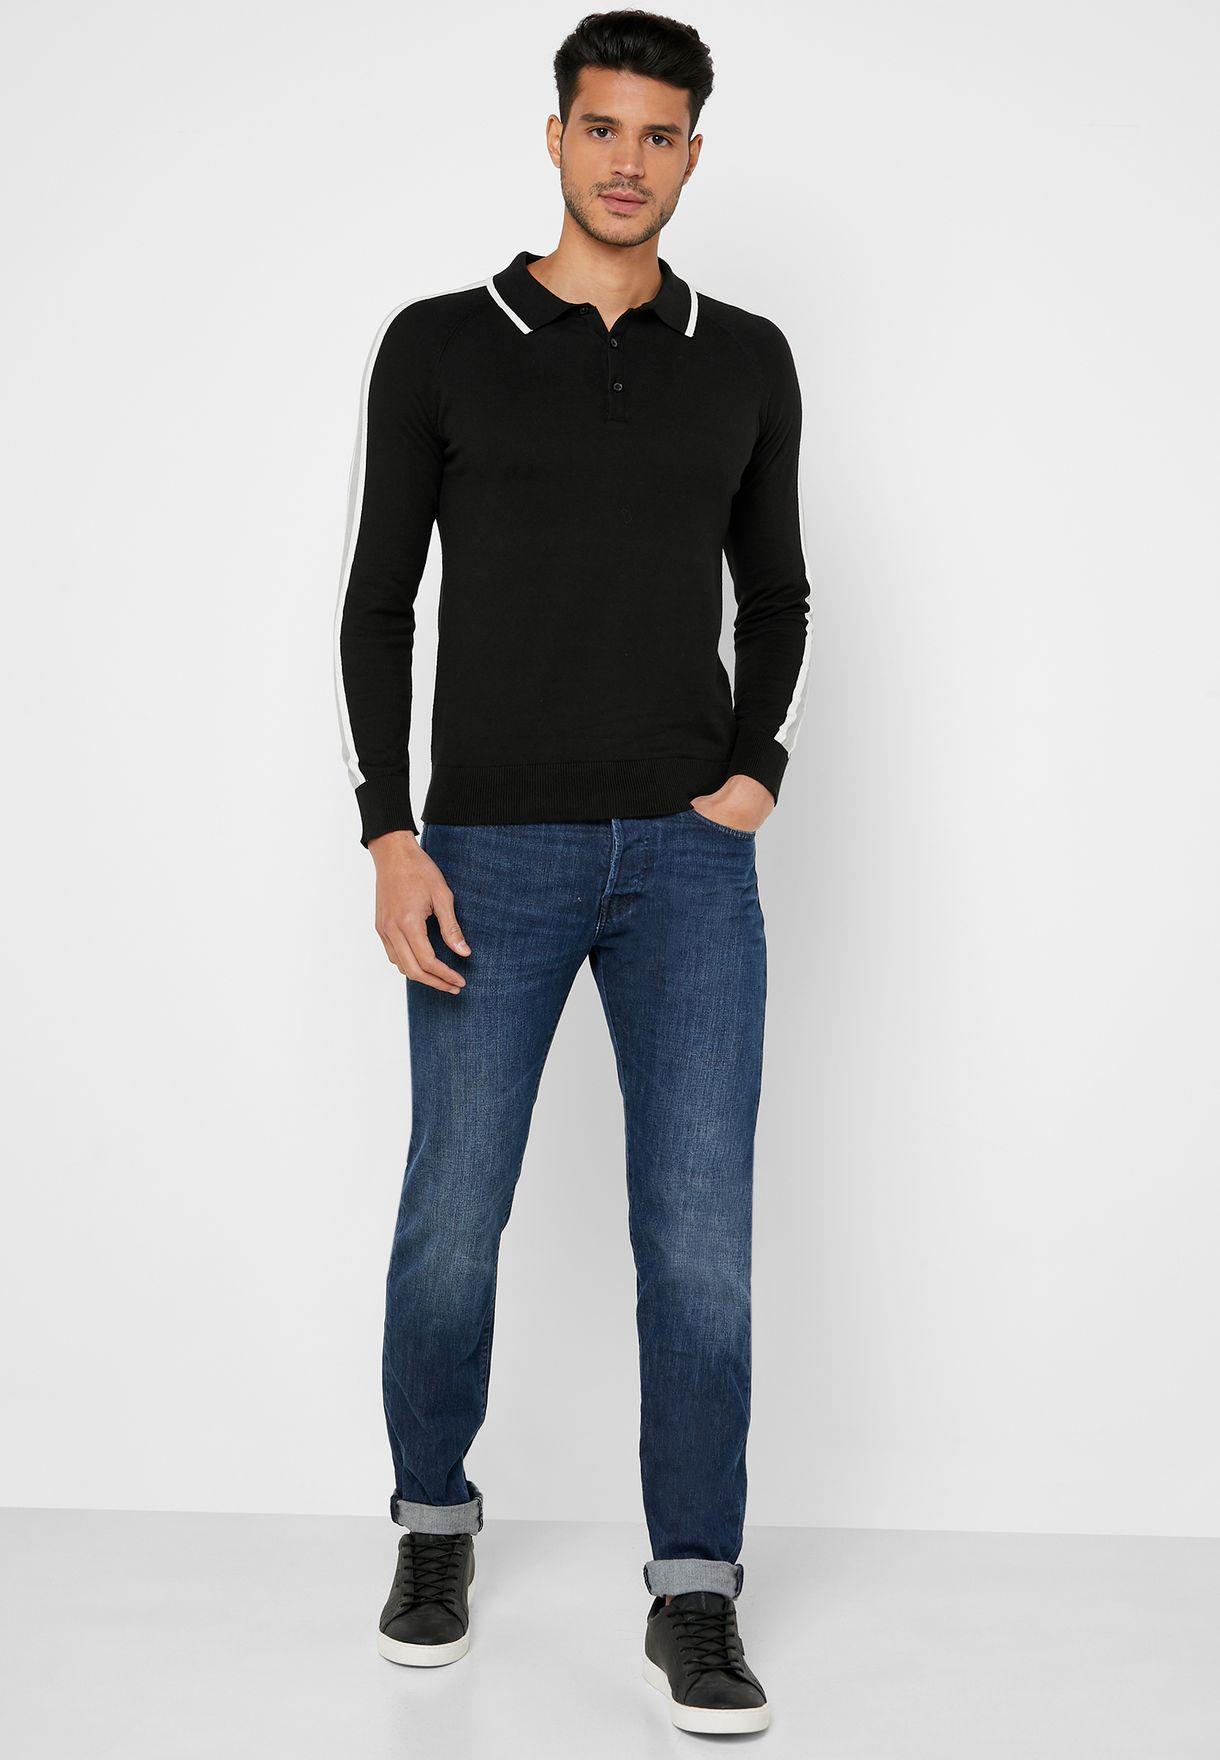 Arm Stripe Knit Sweater